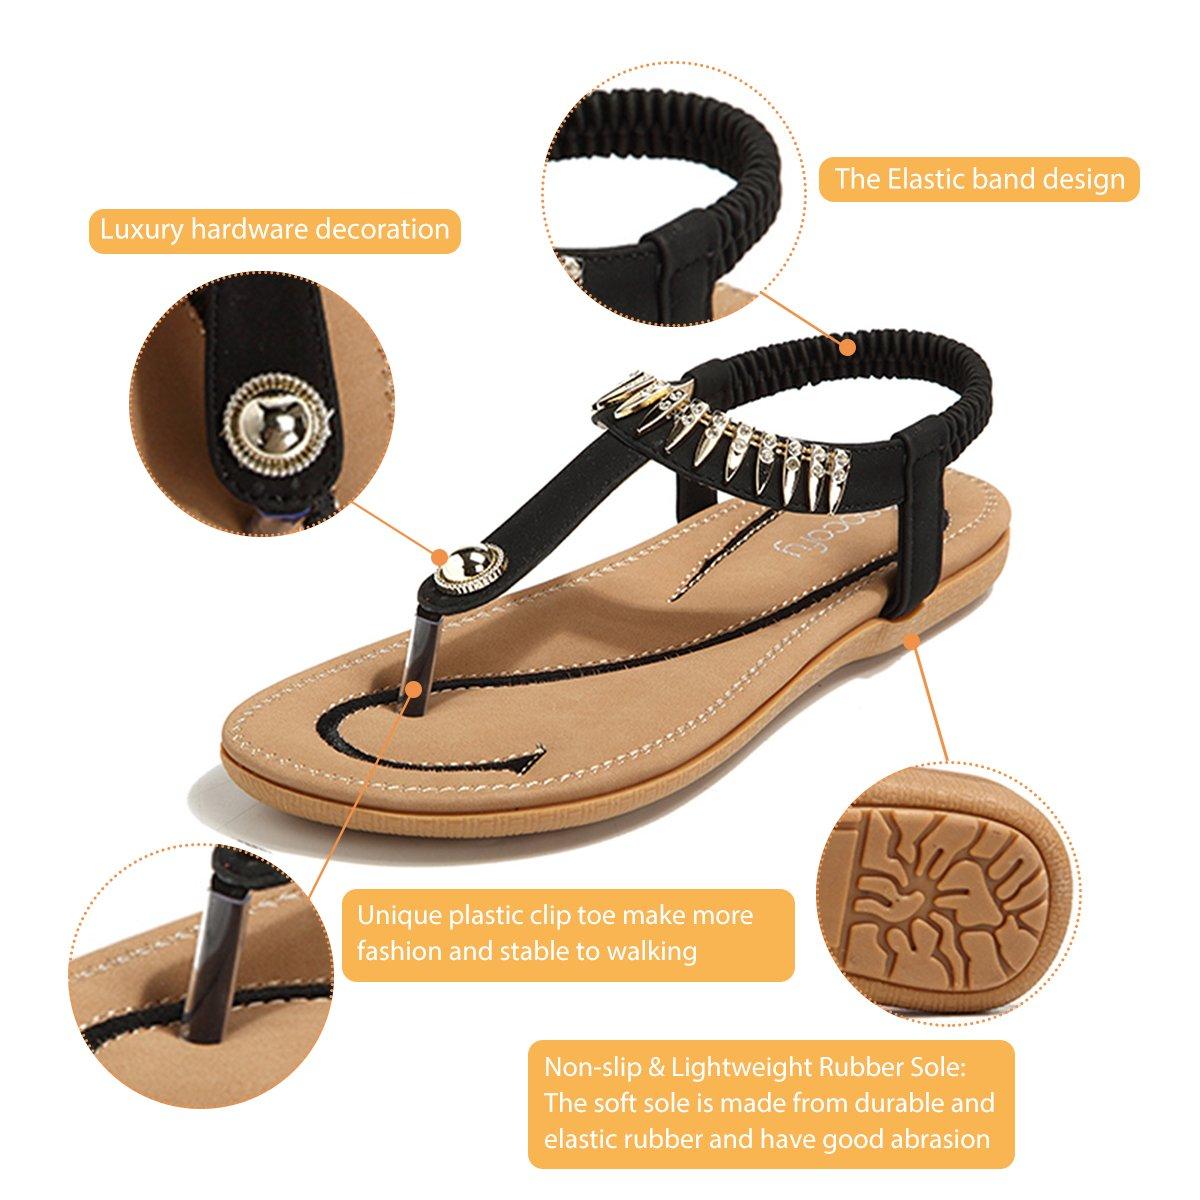 ddd7ec9df3ec92 gracosy Women Summer Low Flat Heel Flip Flop Sandals Slip On Post Thong  Boho Shoes with Rhinestone Roman Sandals Comfy Shoes Clip Toe Beach Sandals  Elastic ...